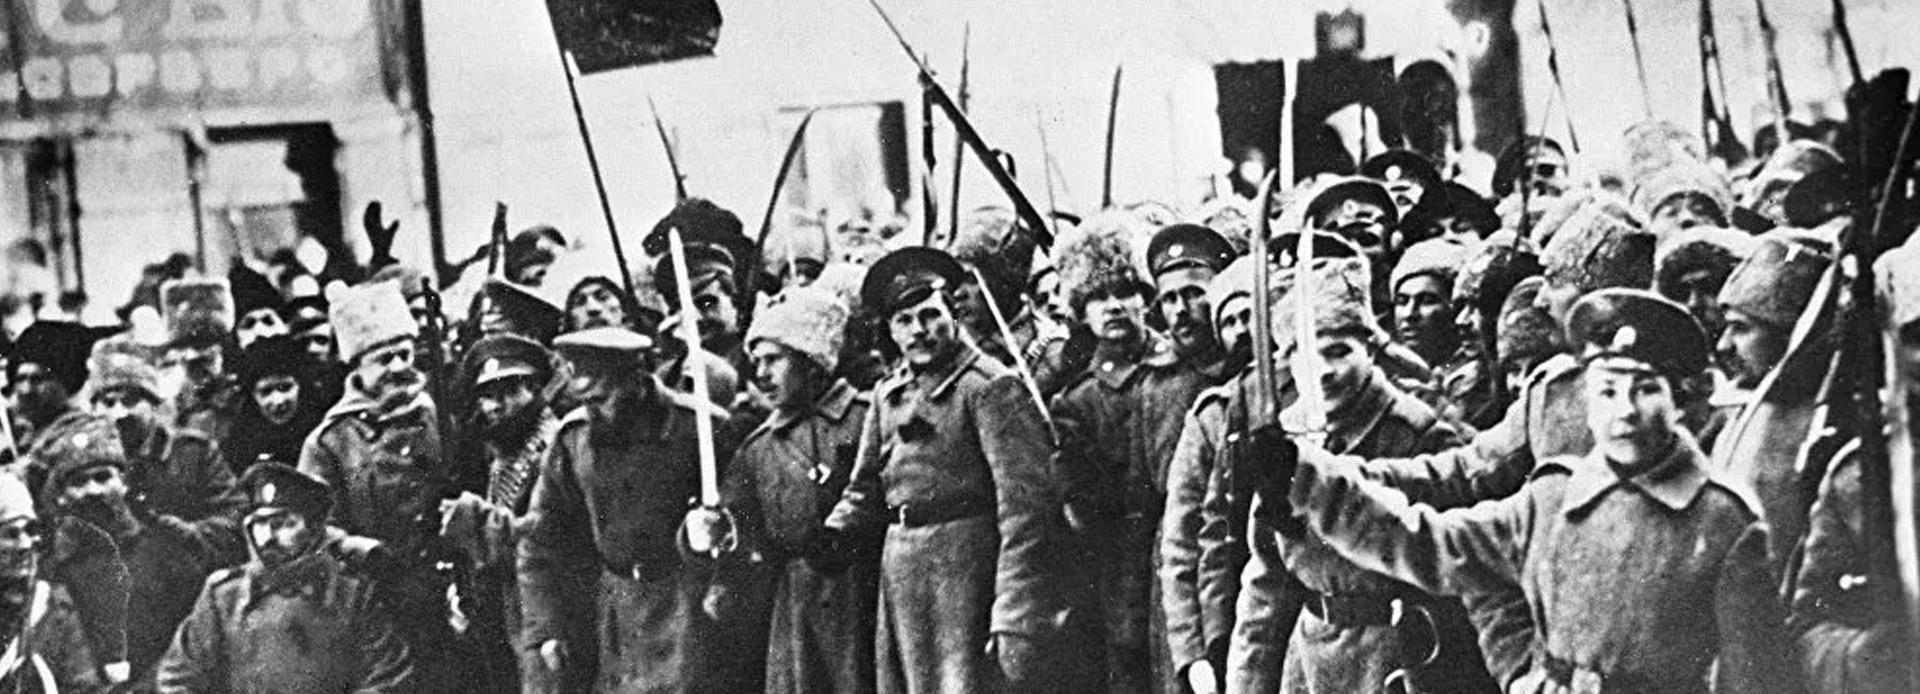 Apuntes sobre la Revolución Rusa de 1917  56da43eb0a3